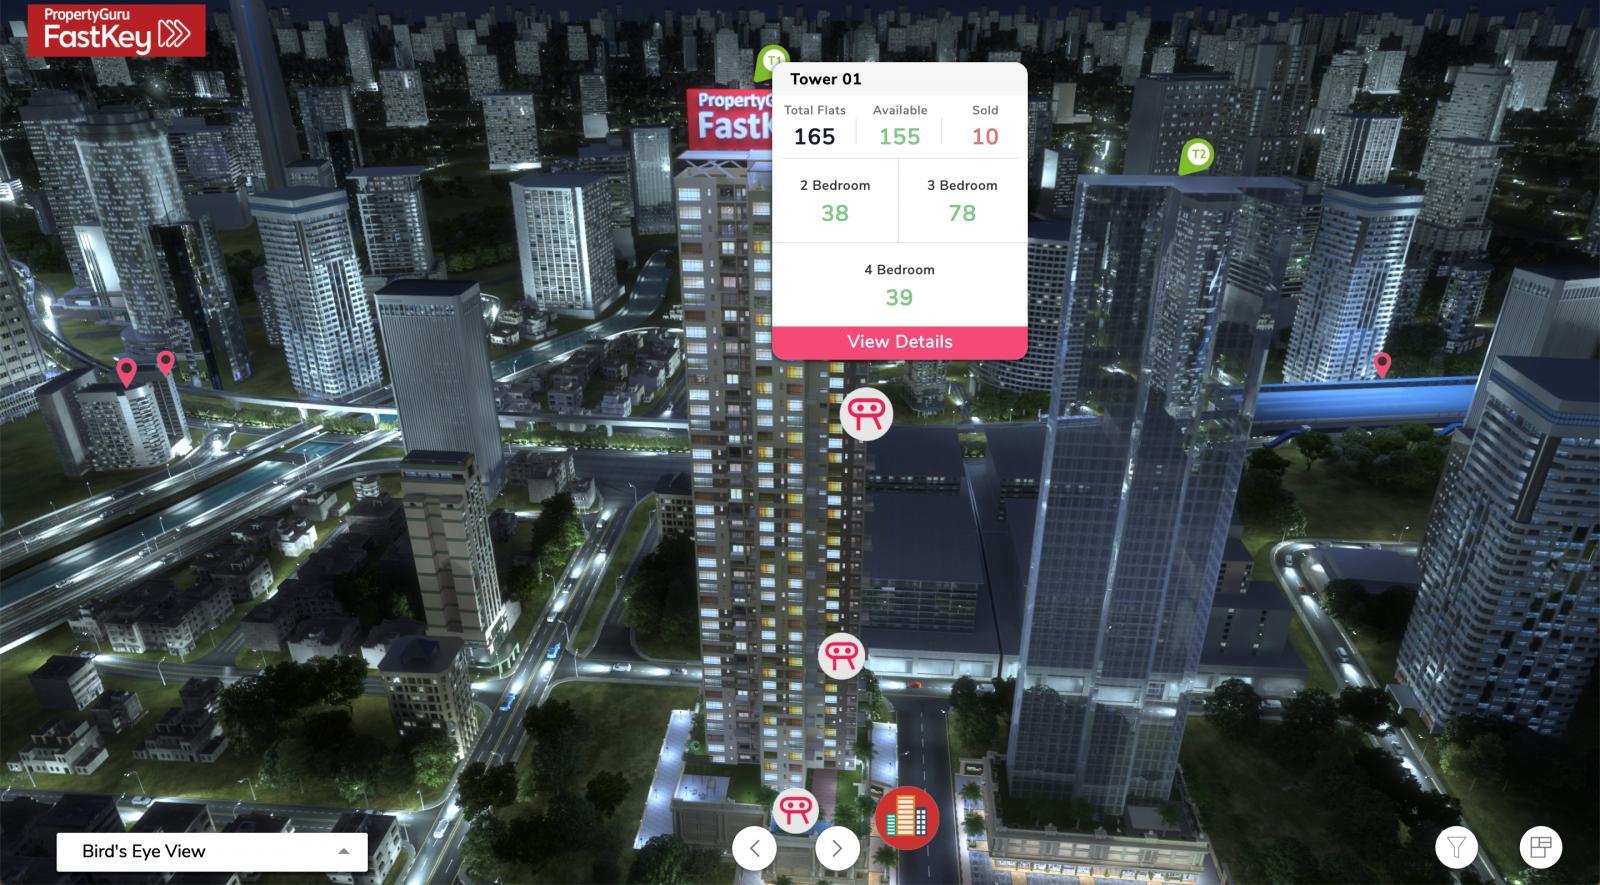 Interface of PropertyGuru FastKey platform